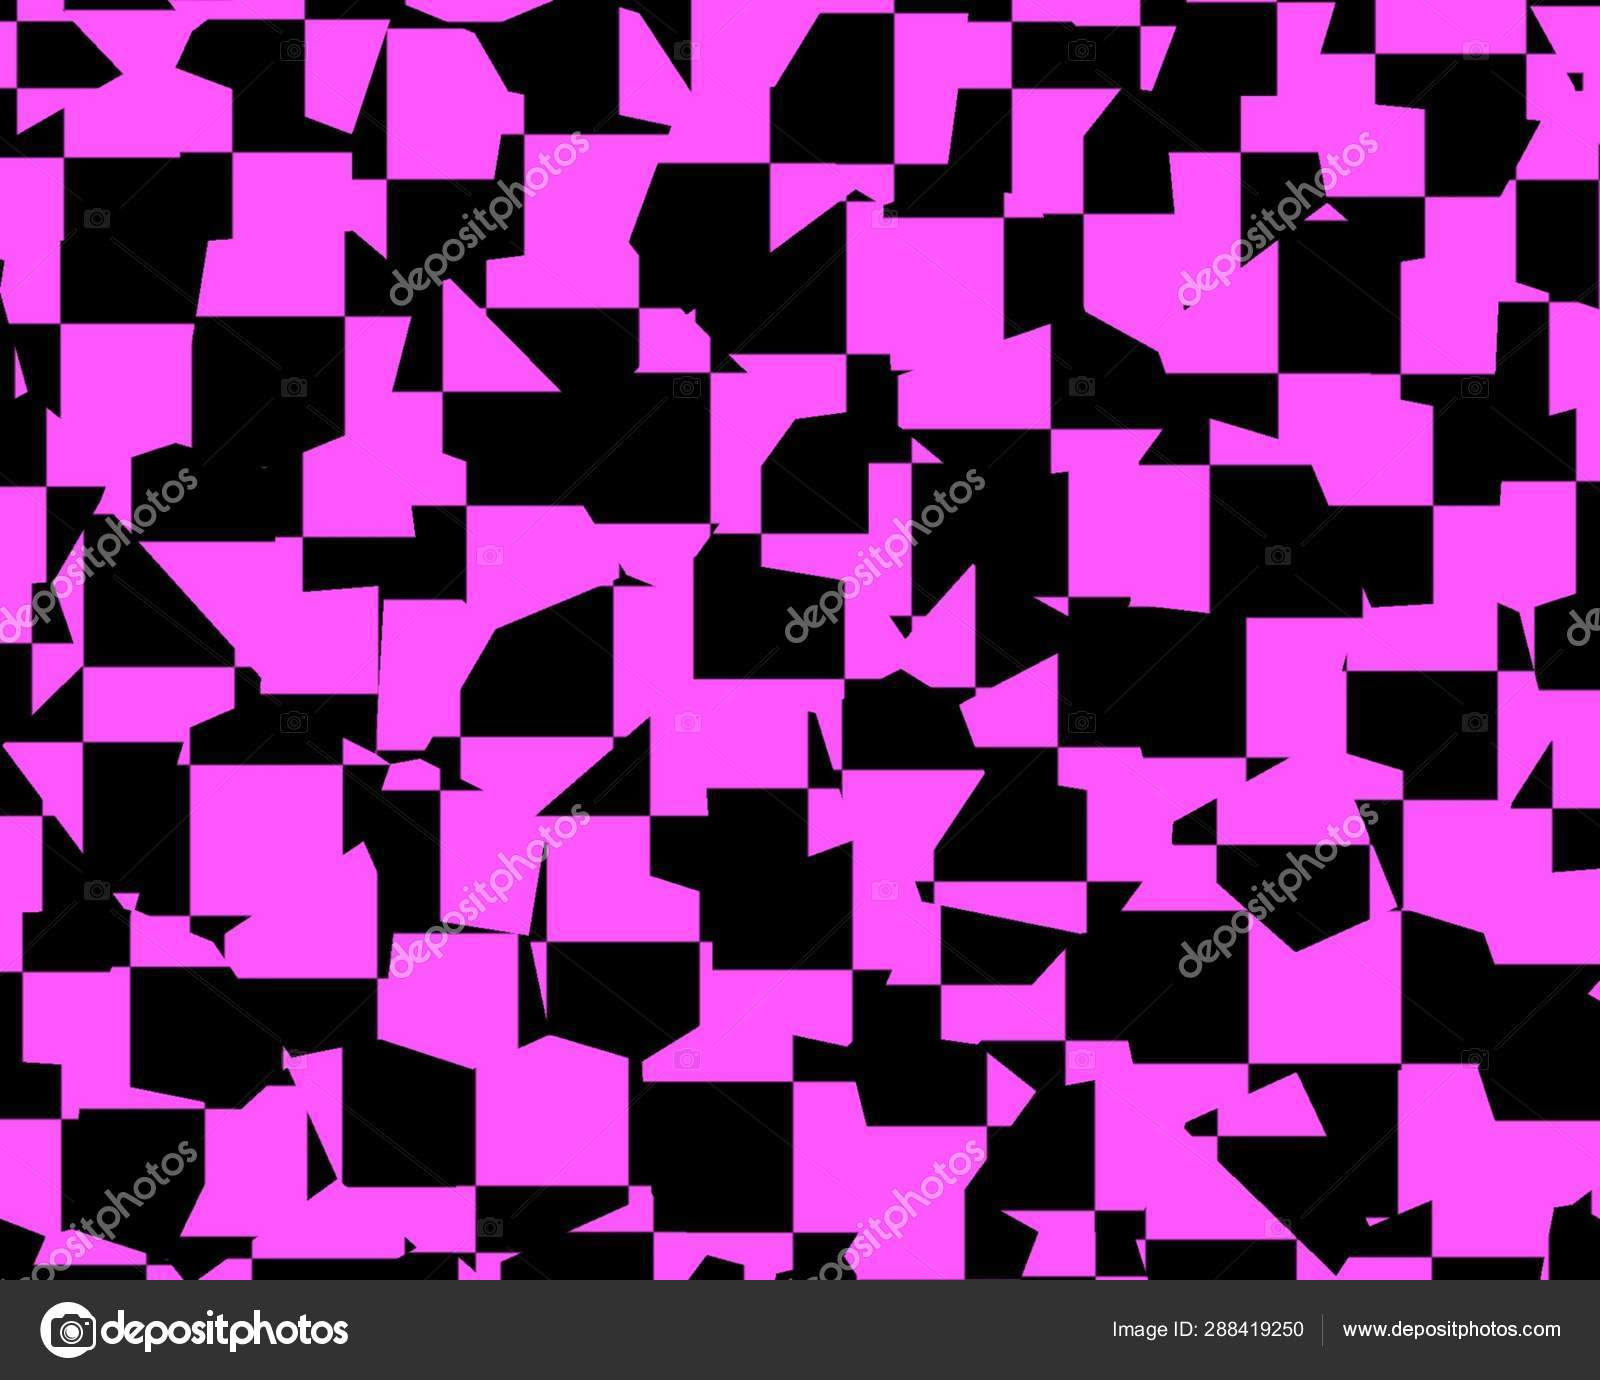 black pink abstract background desktop wallpaper website design